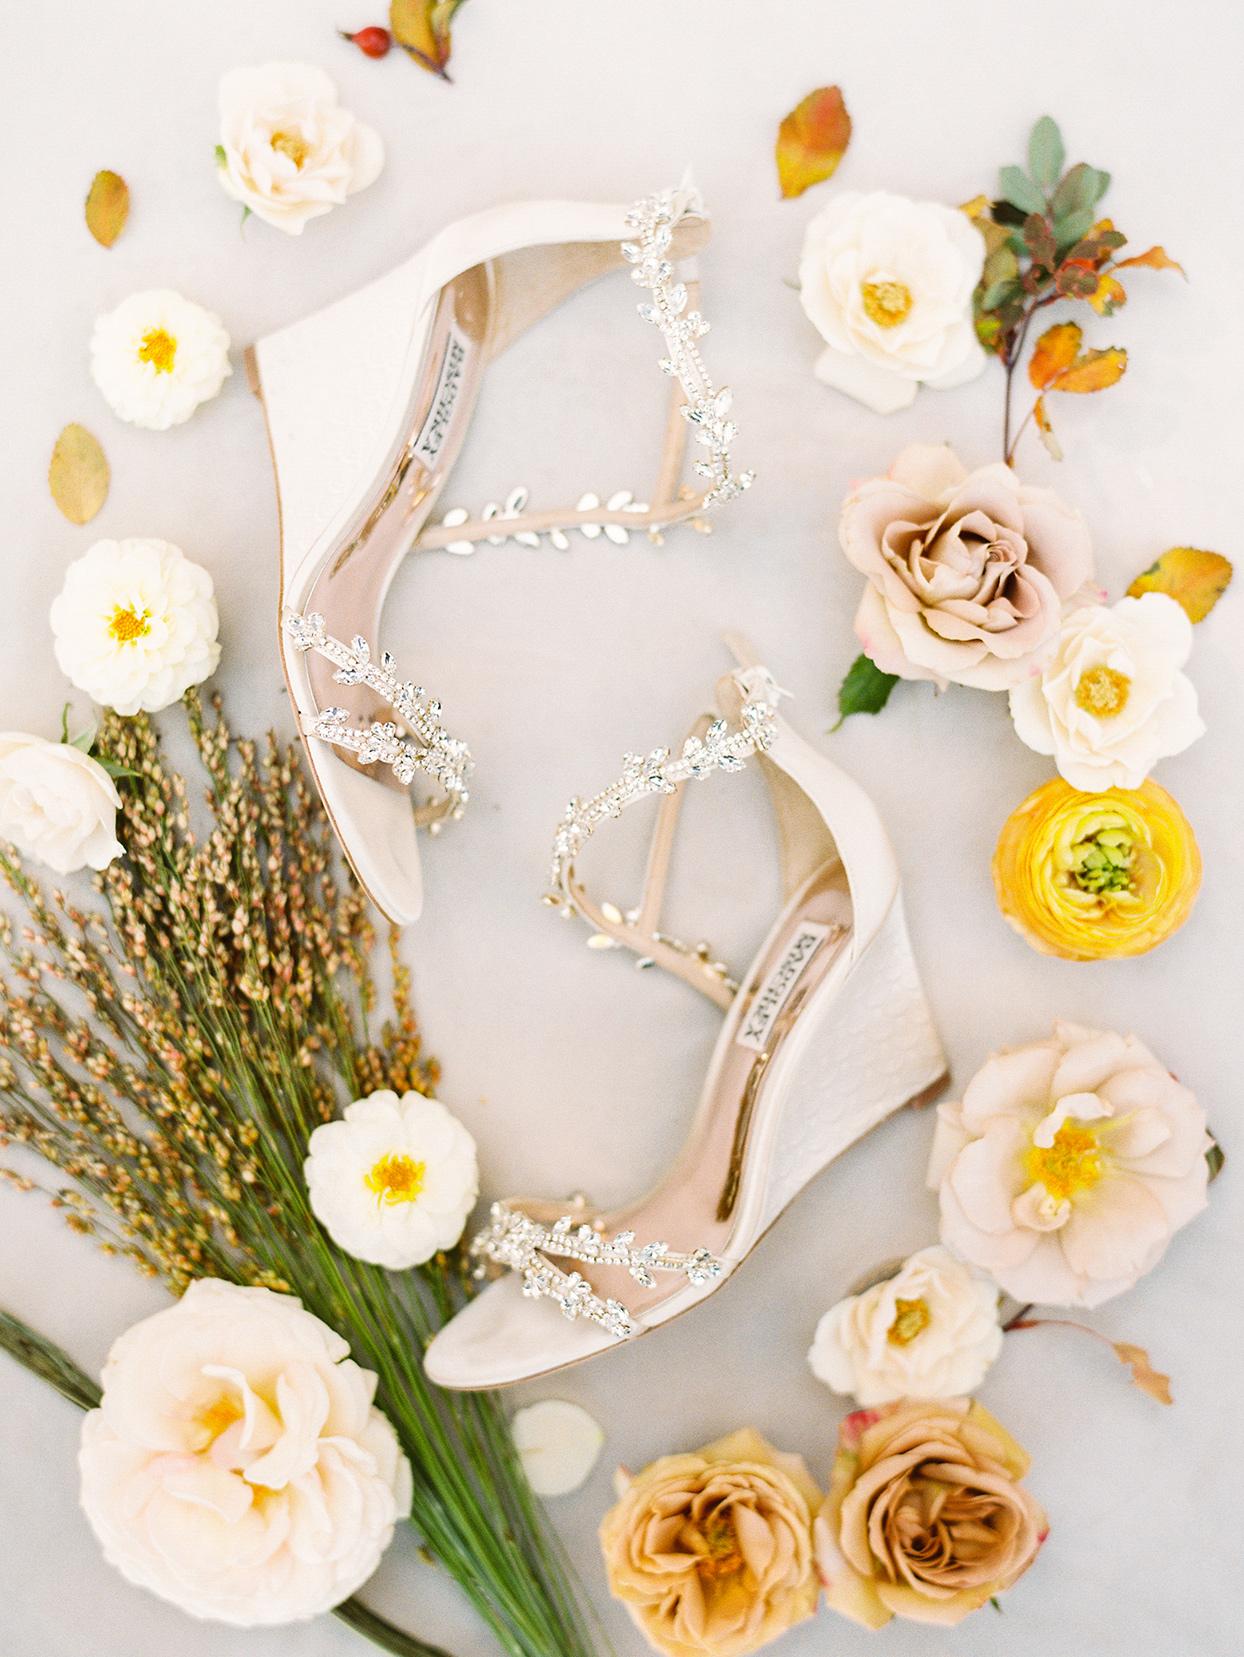 alexandra david wedding bride's white jeweled shoes